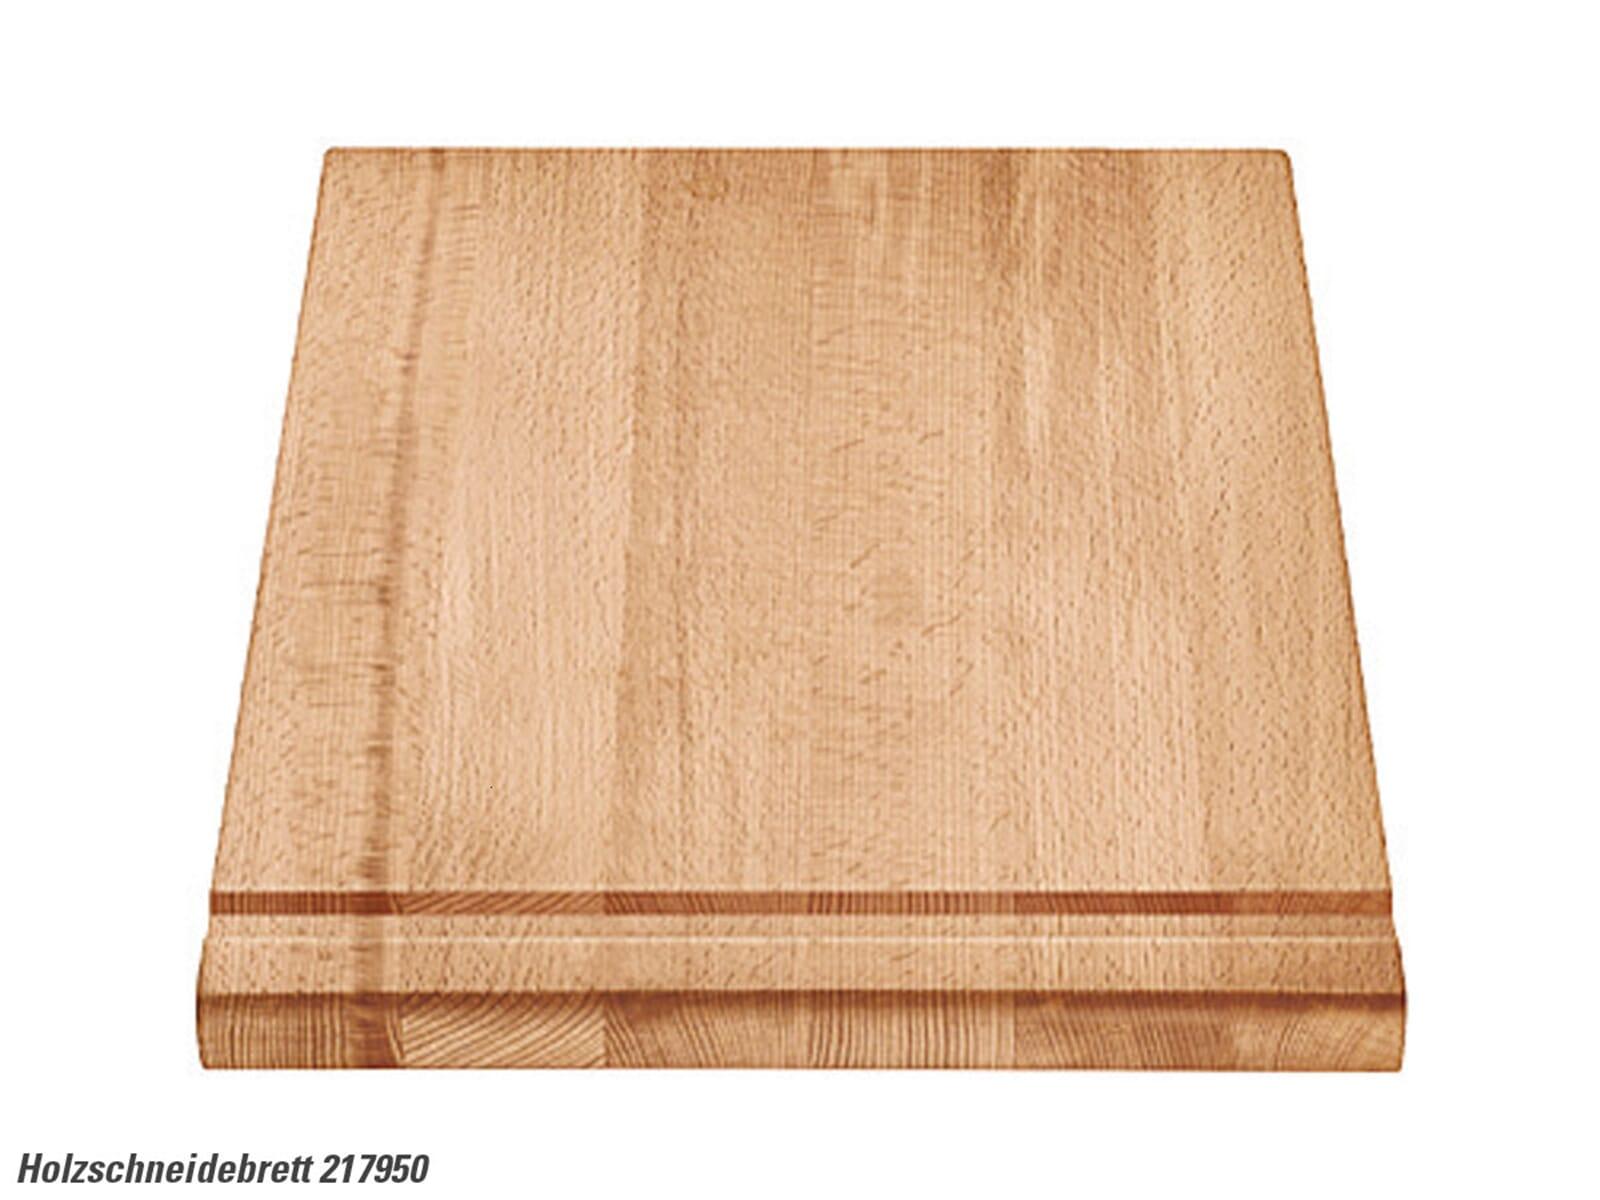 Blanco 217 950 Holzschneidebrett Buche